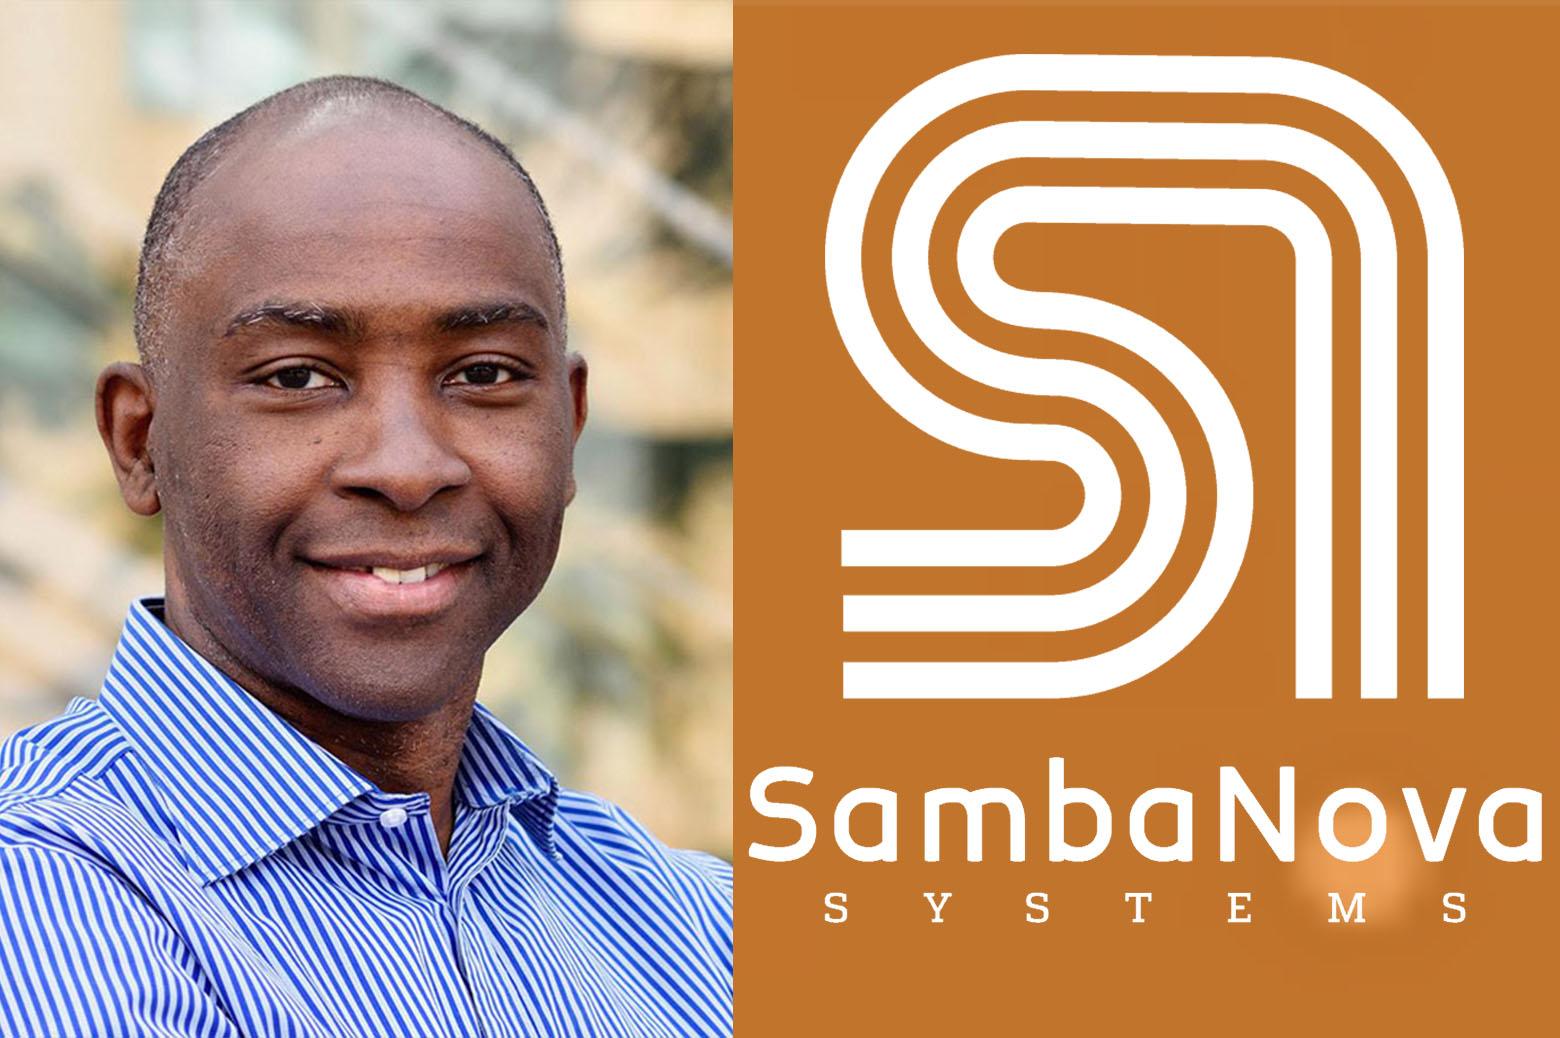 Kunle Olukotun and Sambanova logo